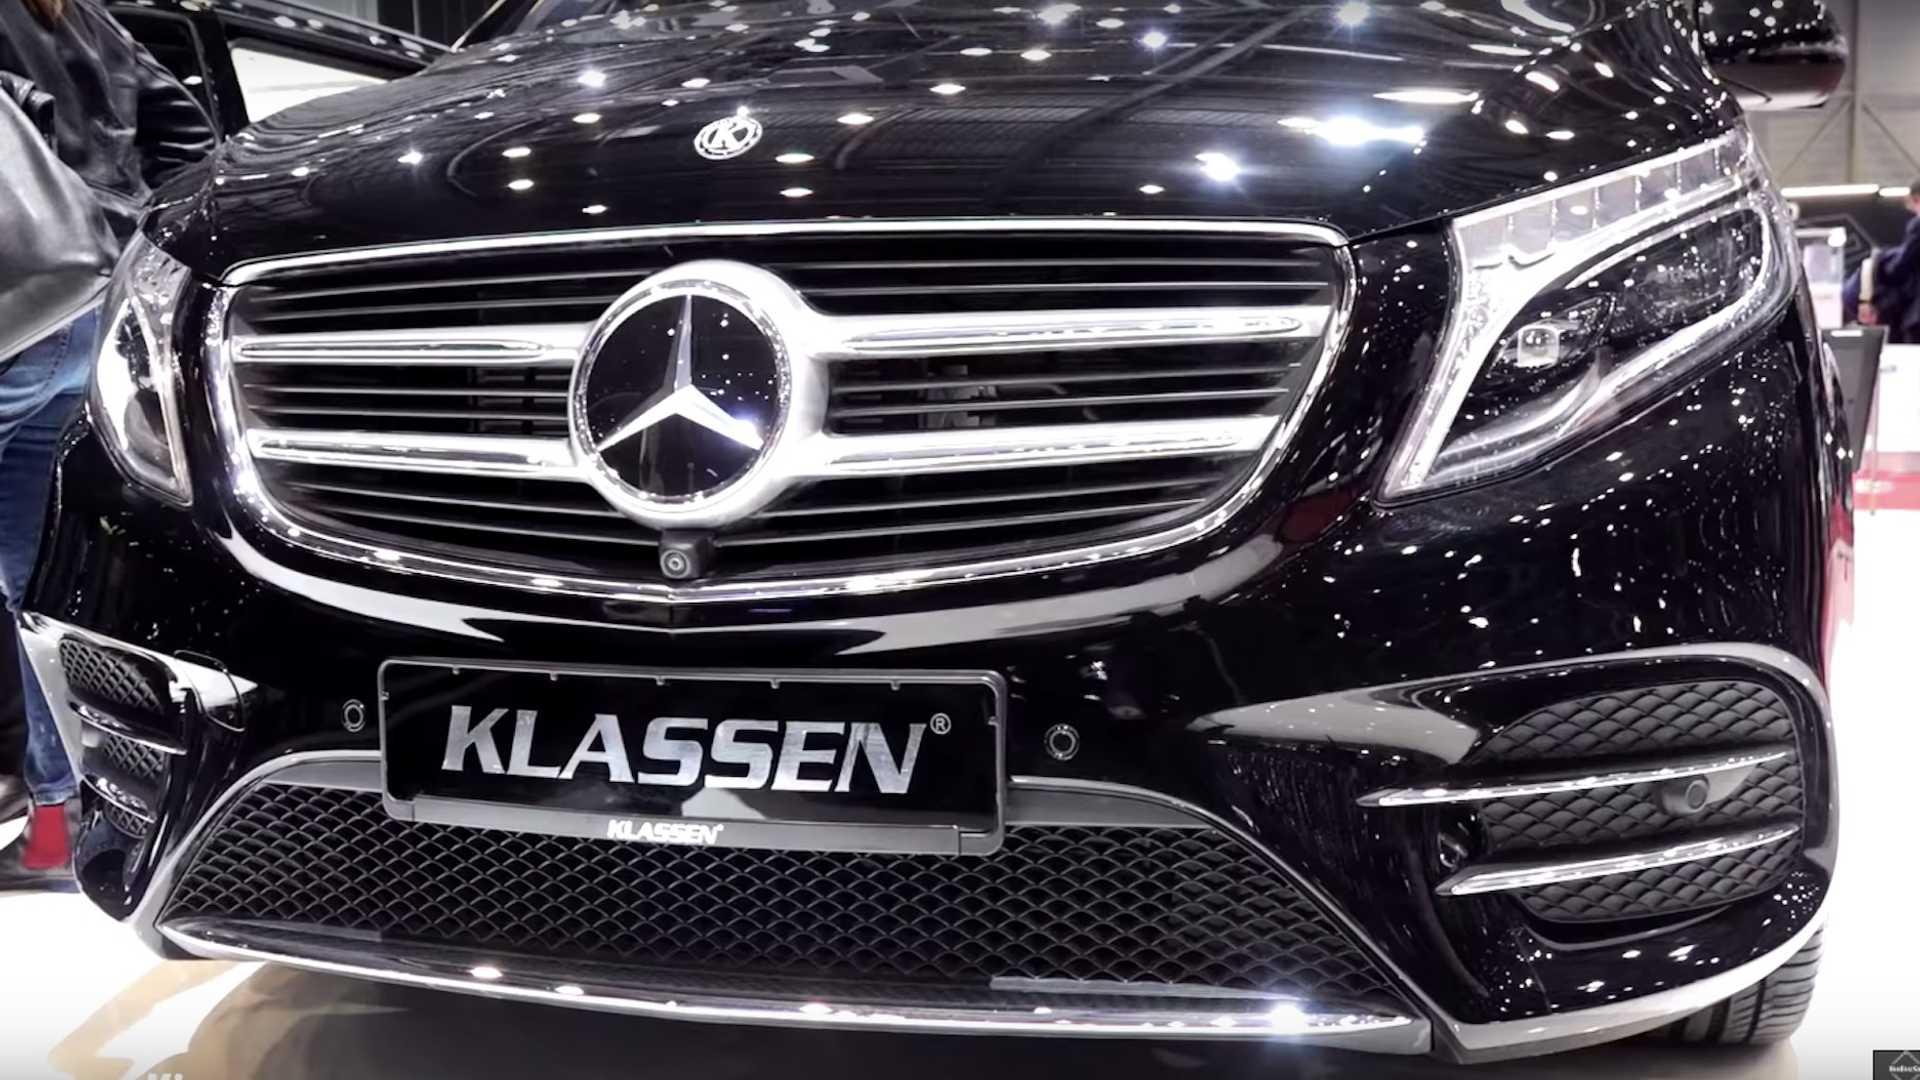 Mercedes Classe V Klassen